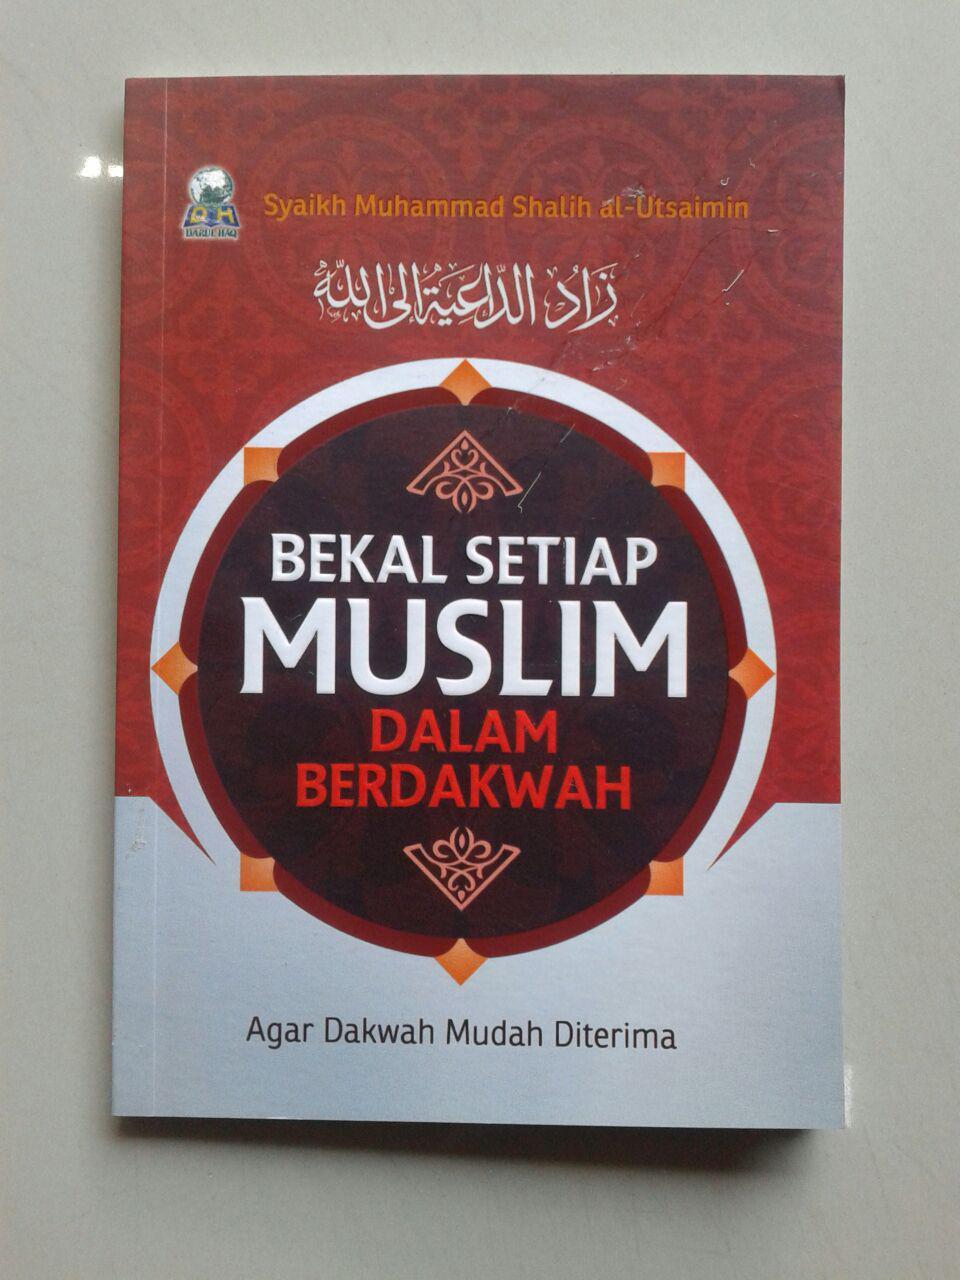 Buku Saku Bekal Setiap Muslim Berdakwah Agar Dakwah Mudah Diterima cover 2